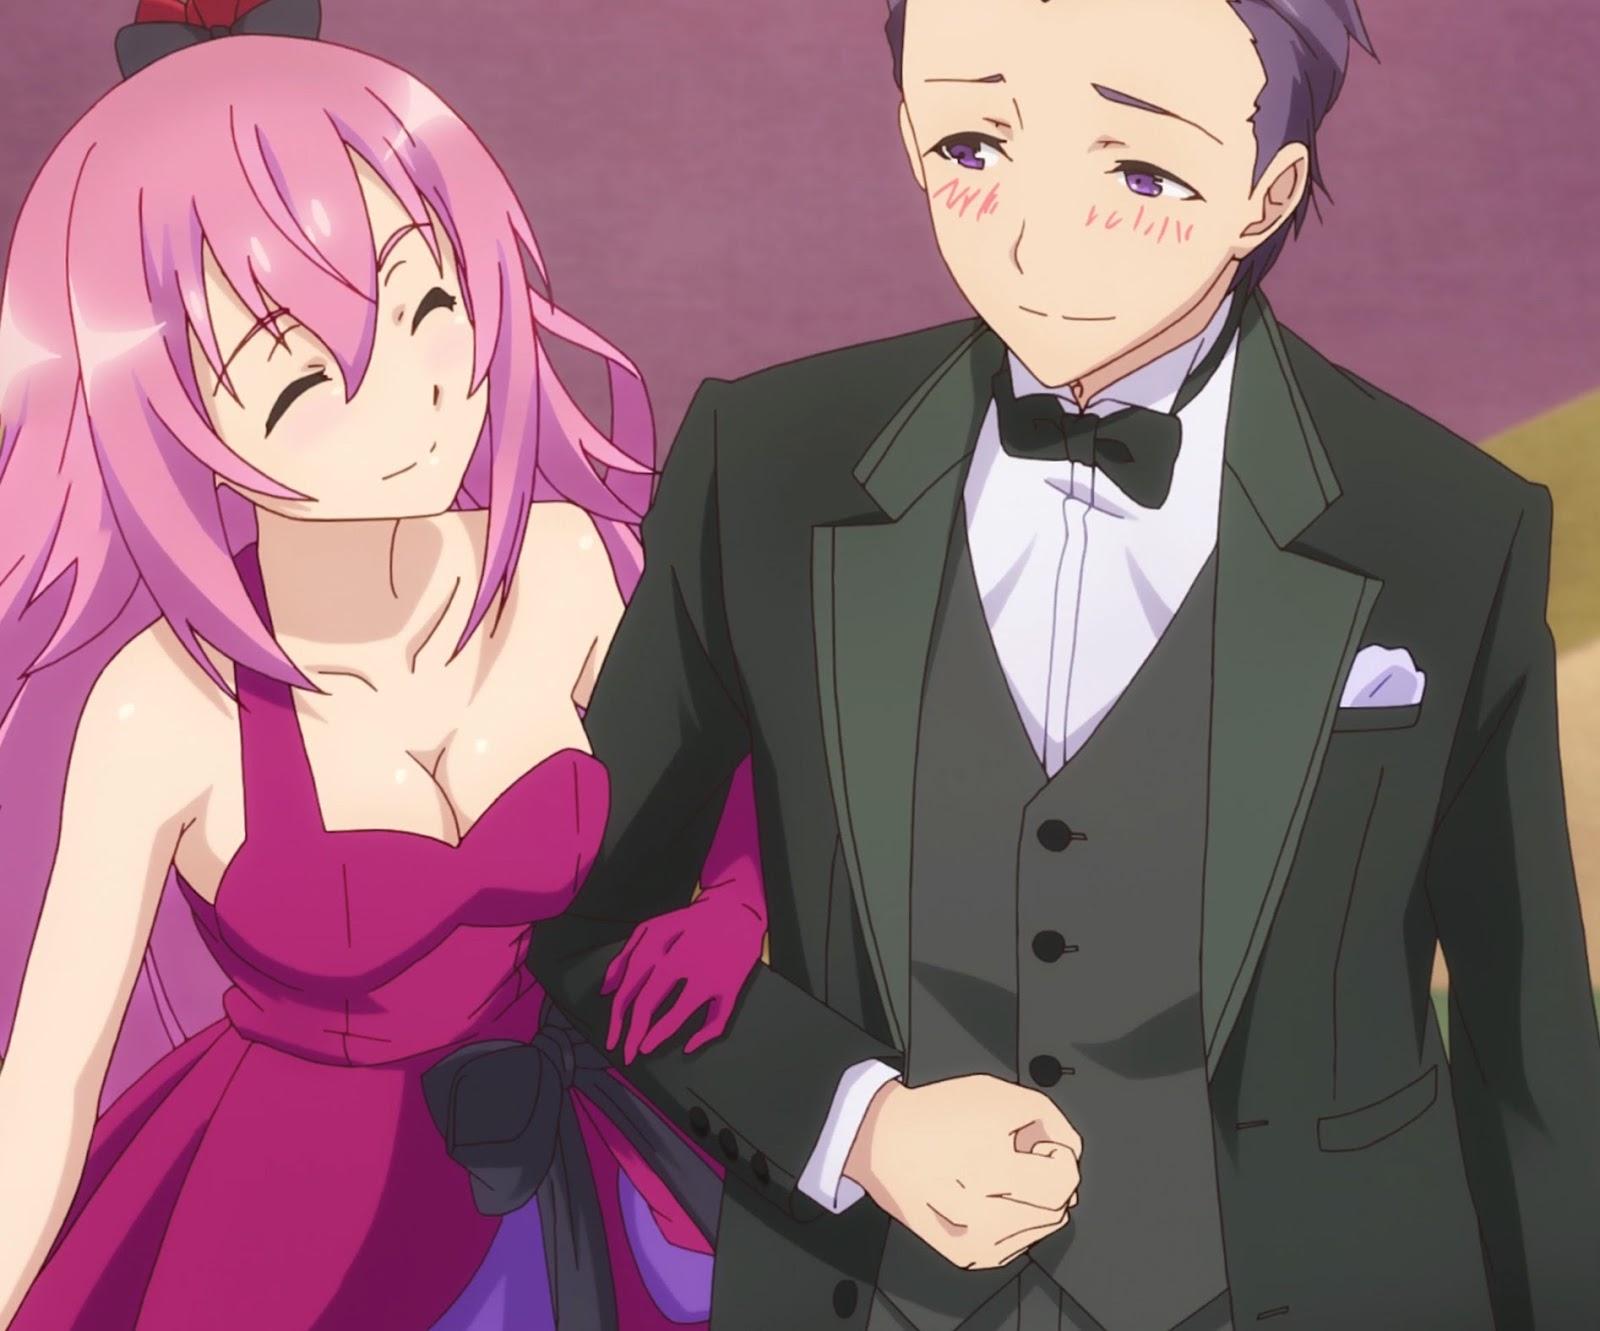 Joeschmos Gears And Grounds Omake Gif Anime - Gakusen -7741